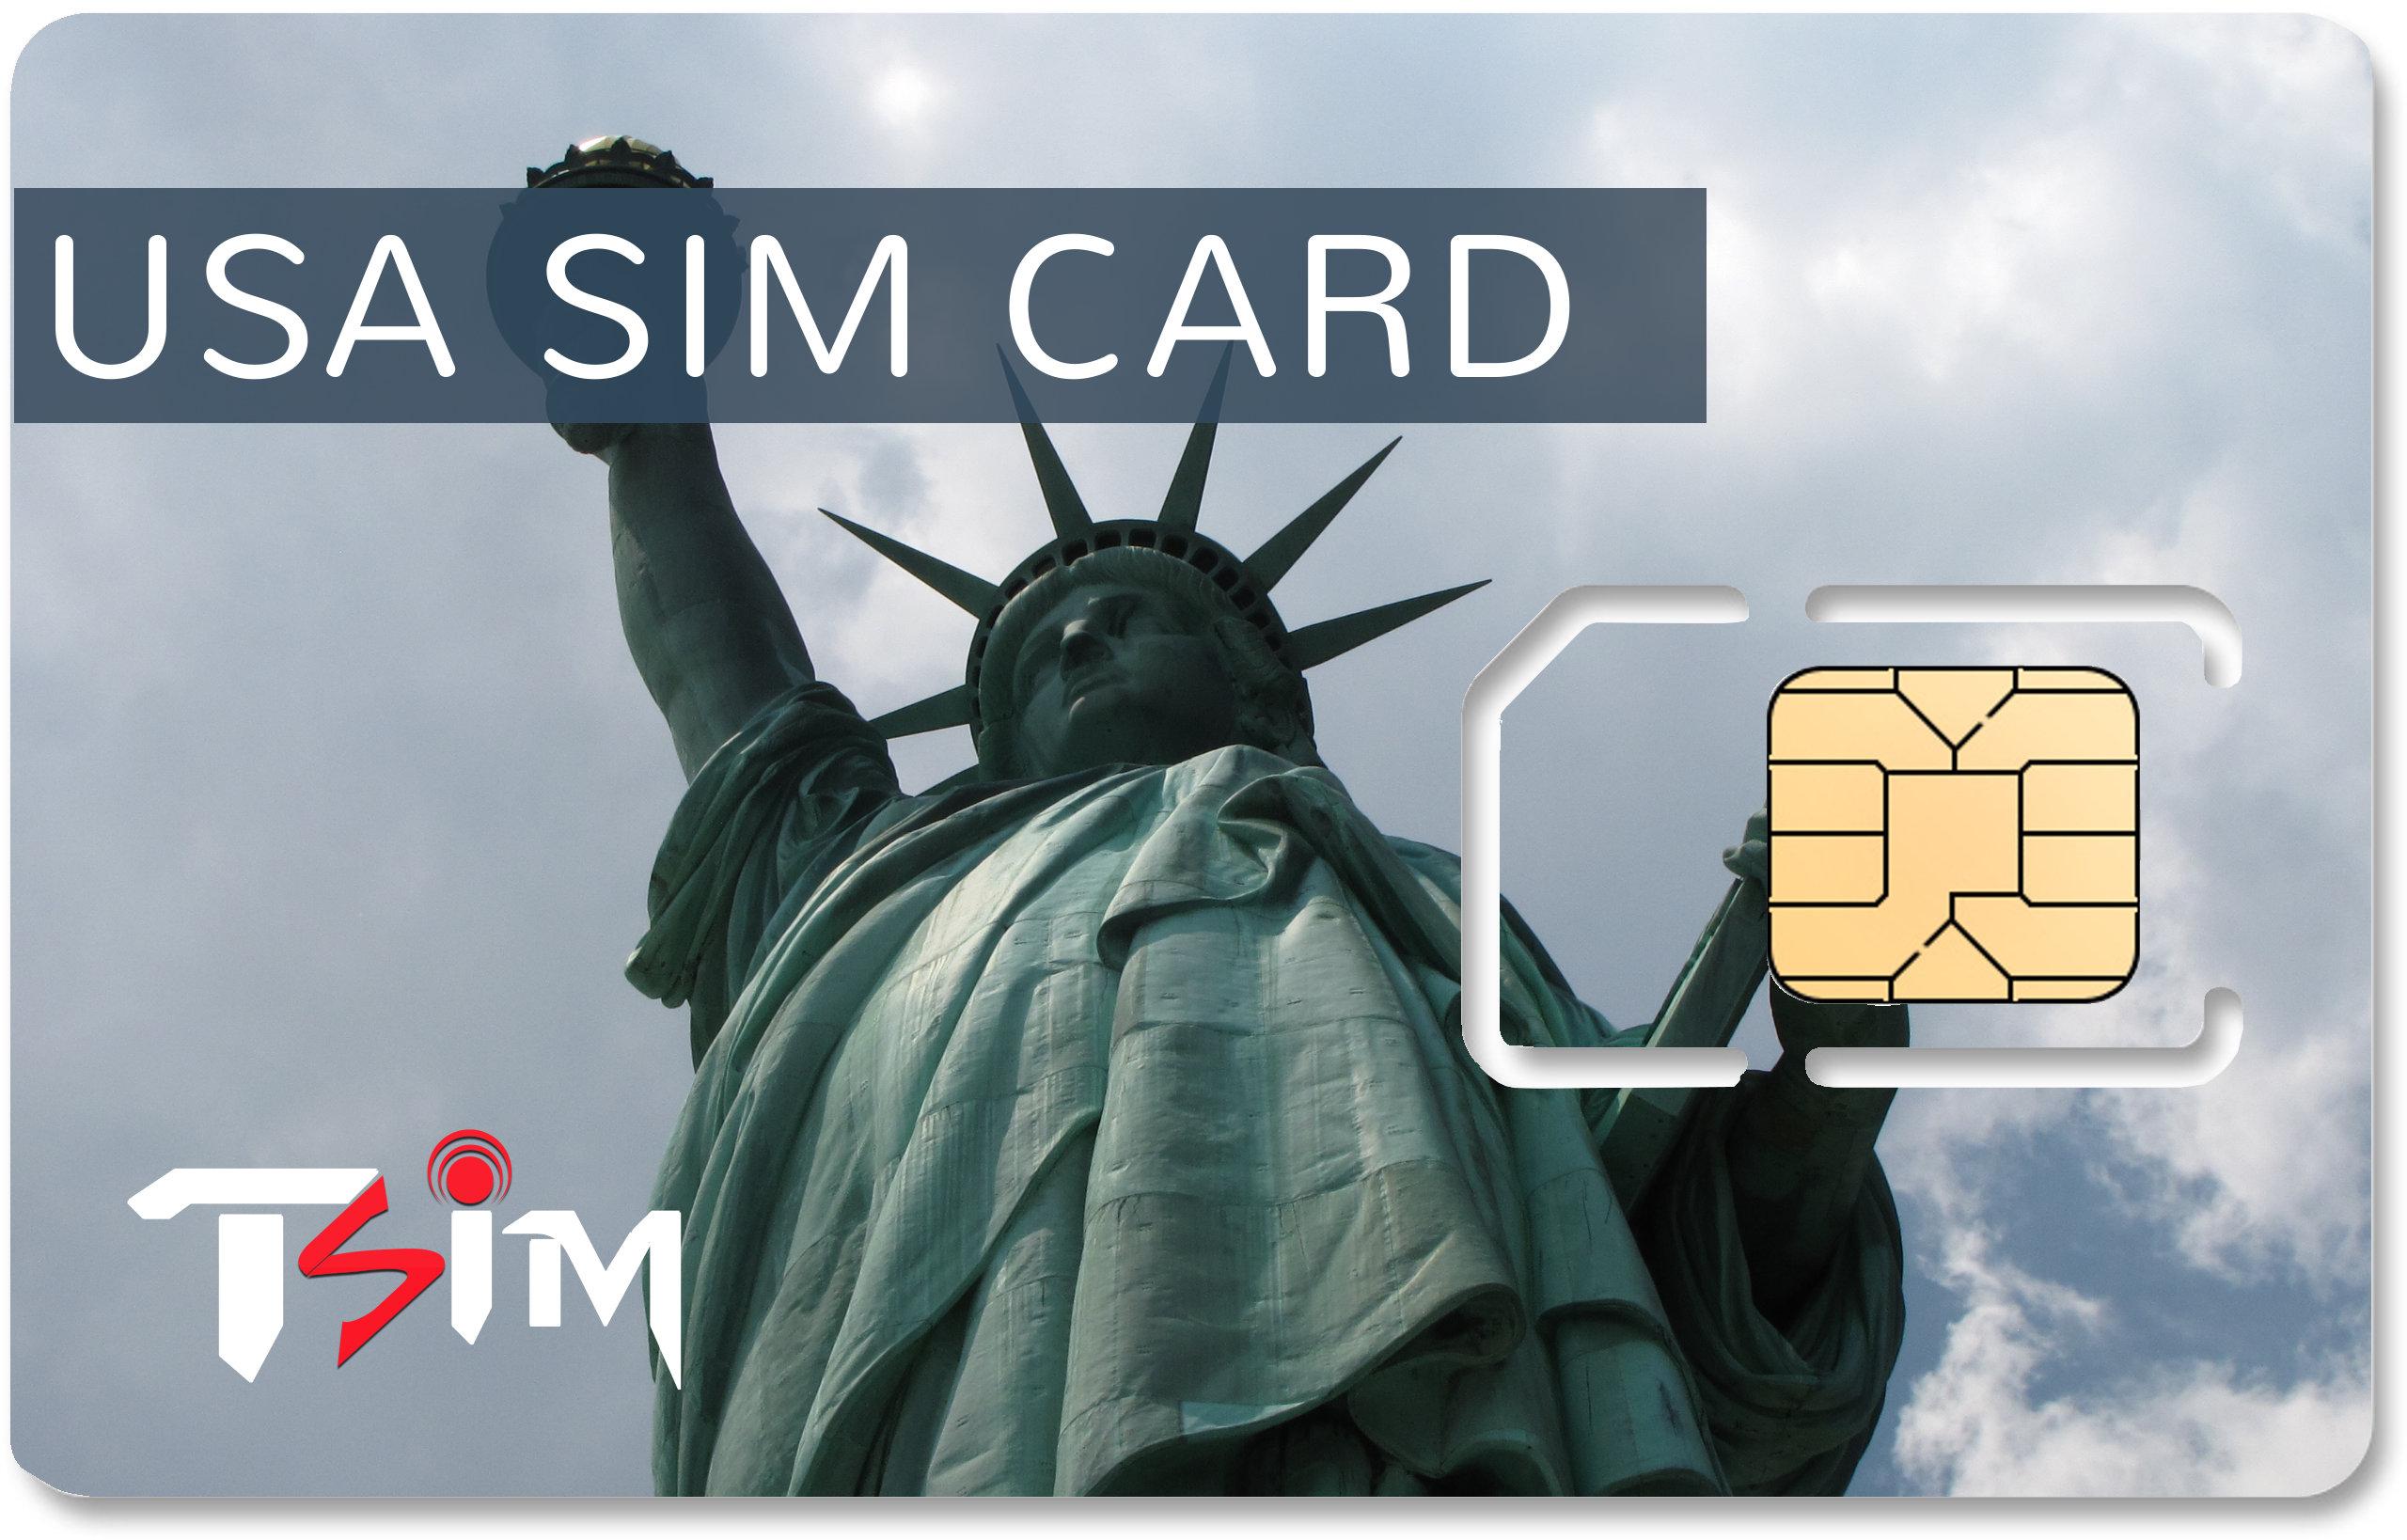 Unlimited USA SIM Card | TSIM's International Roaming SIM Cards